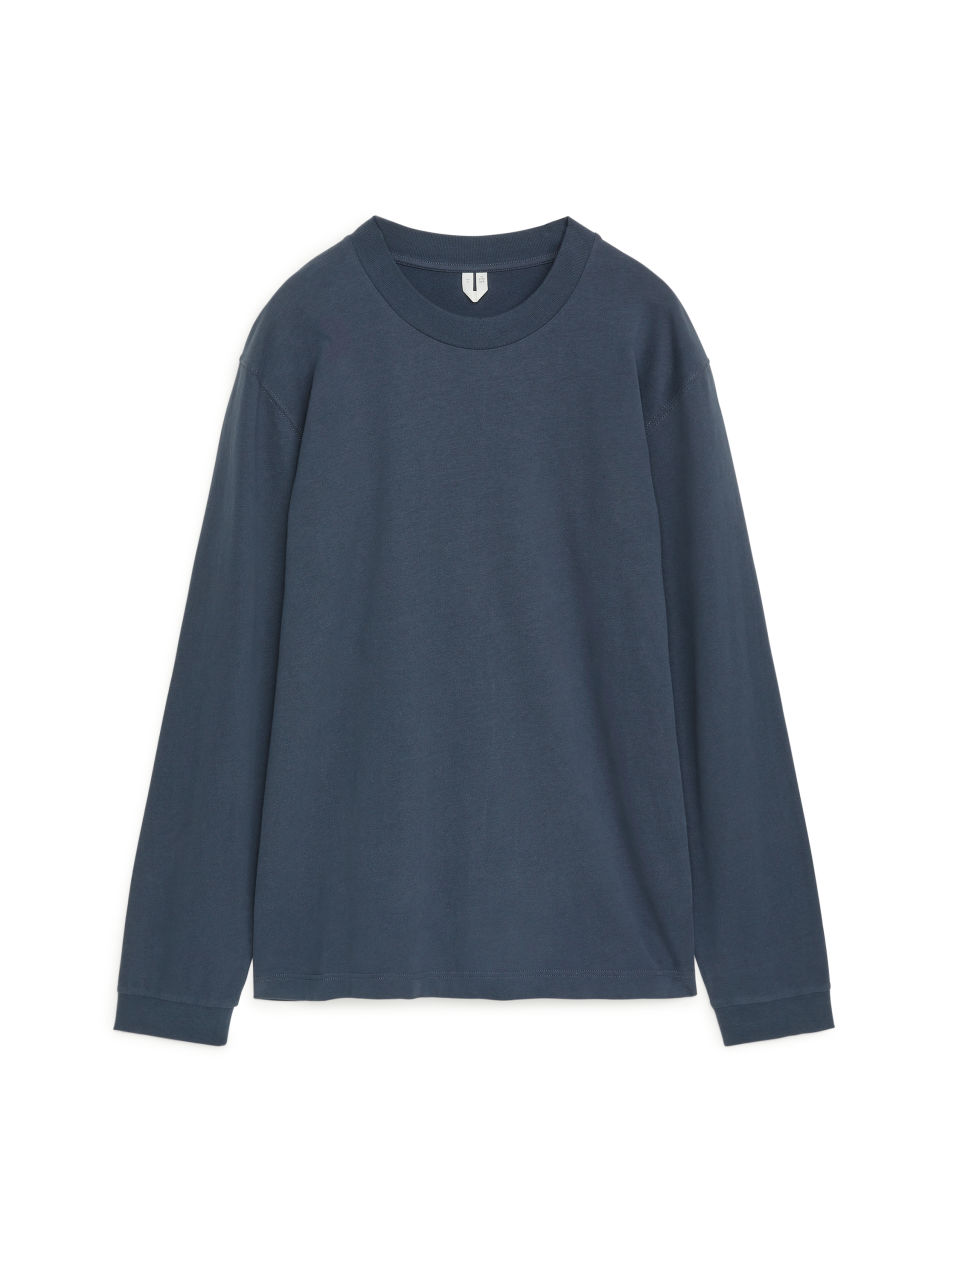 Long-Sleeved Organic Cotton T-Shirt - Blue